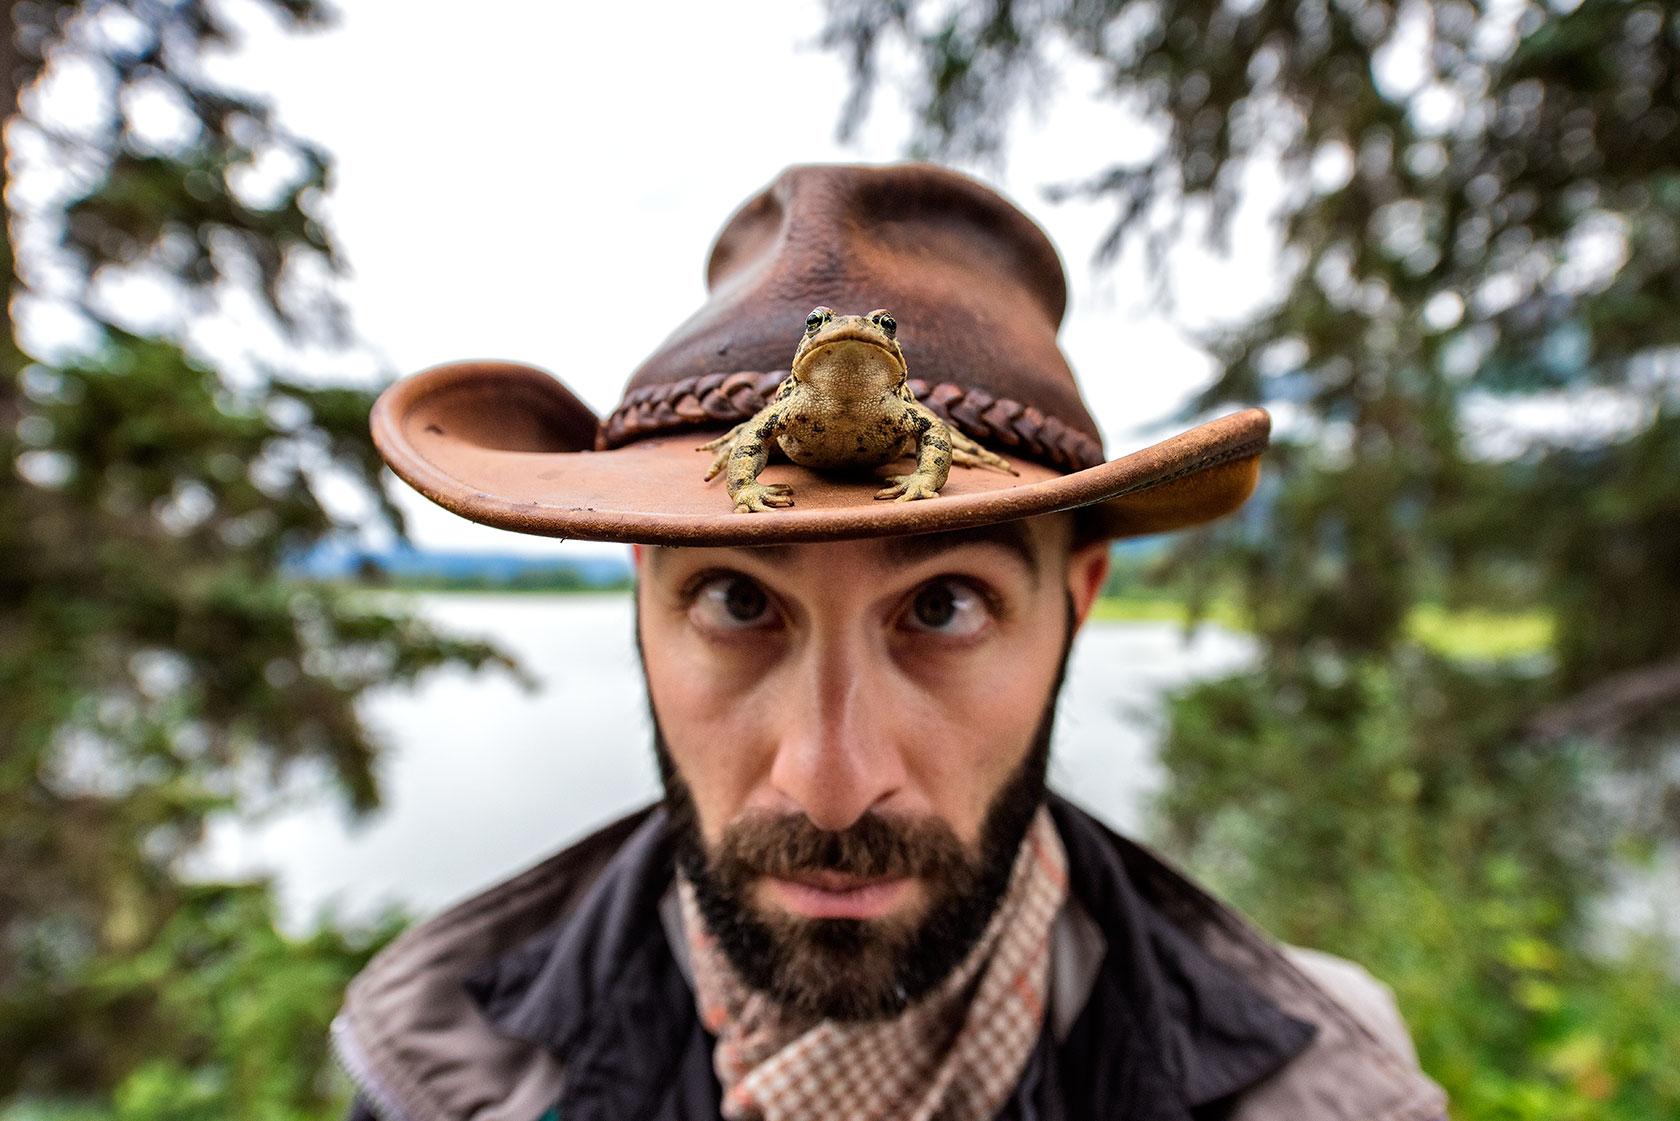 austin-trigg-brave-wilderness-alaska-BW-Coyote-Frog-Hat.jpg